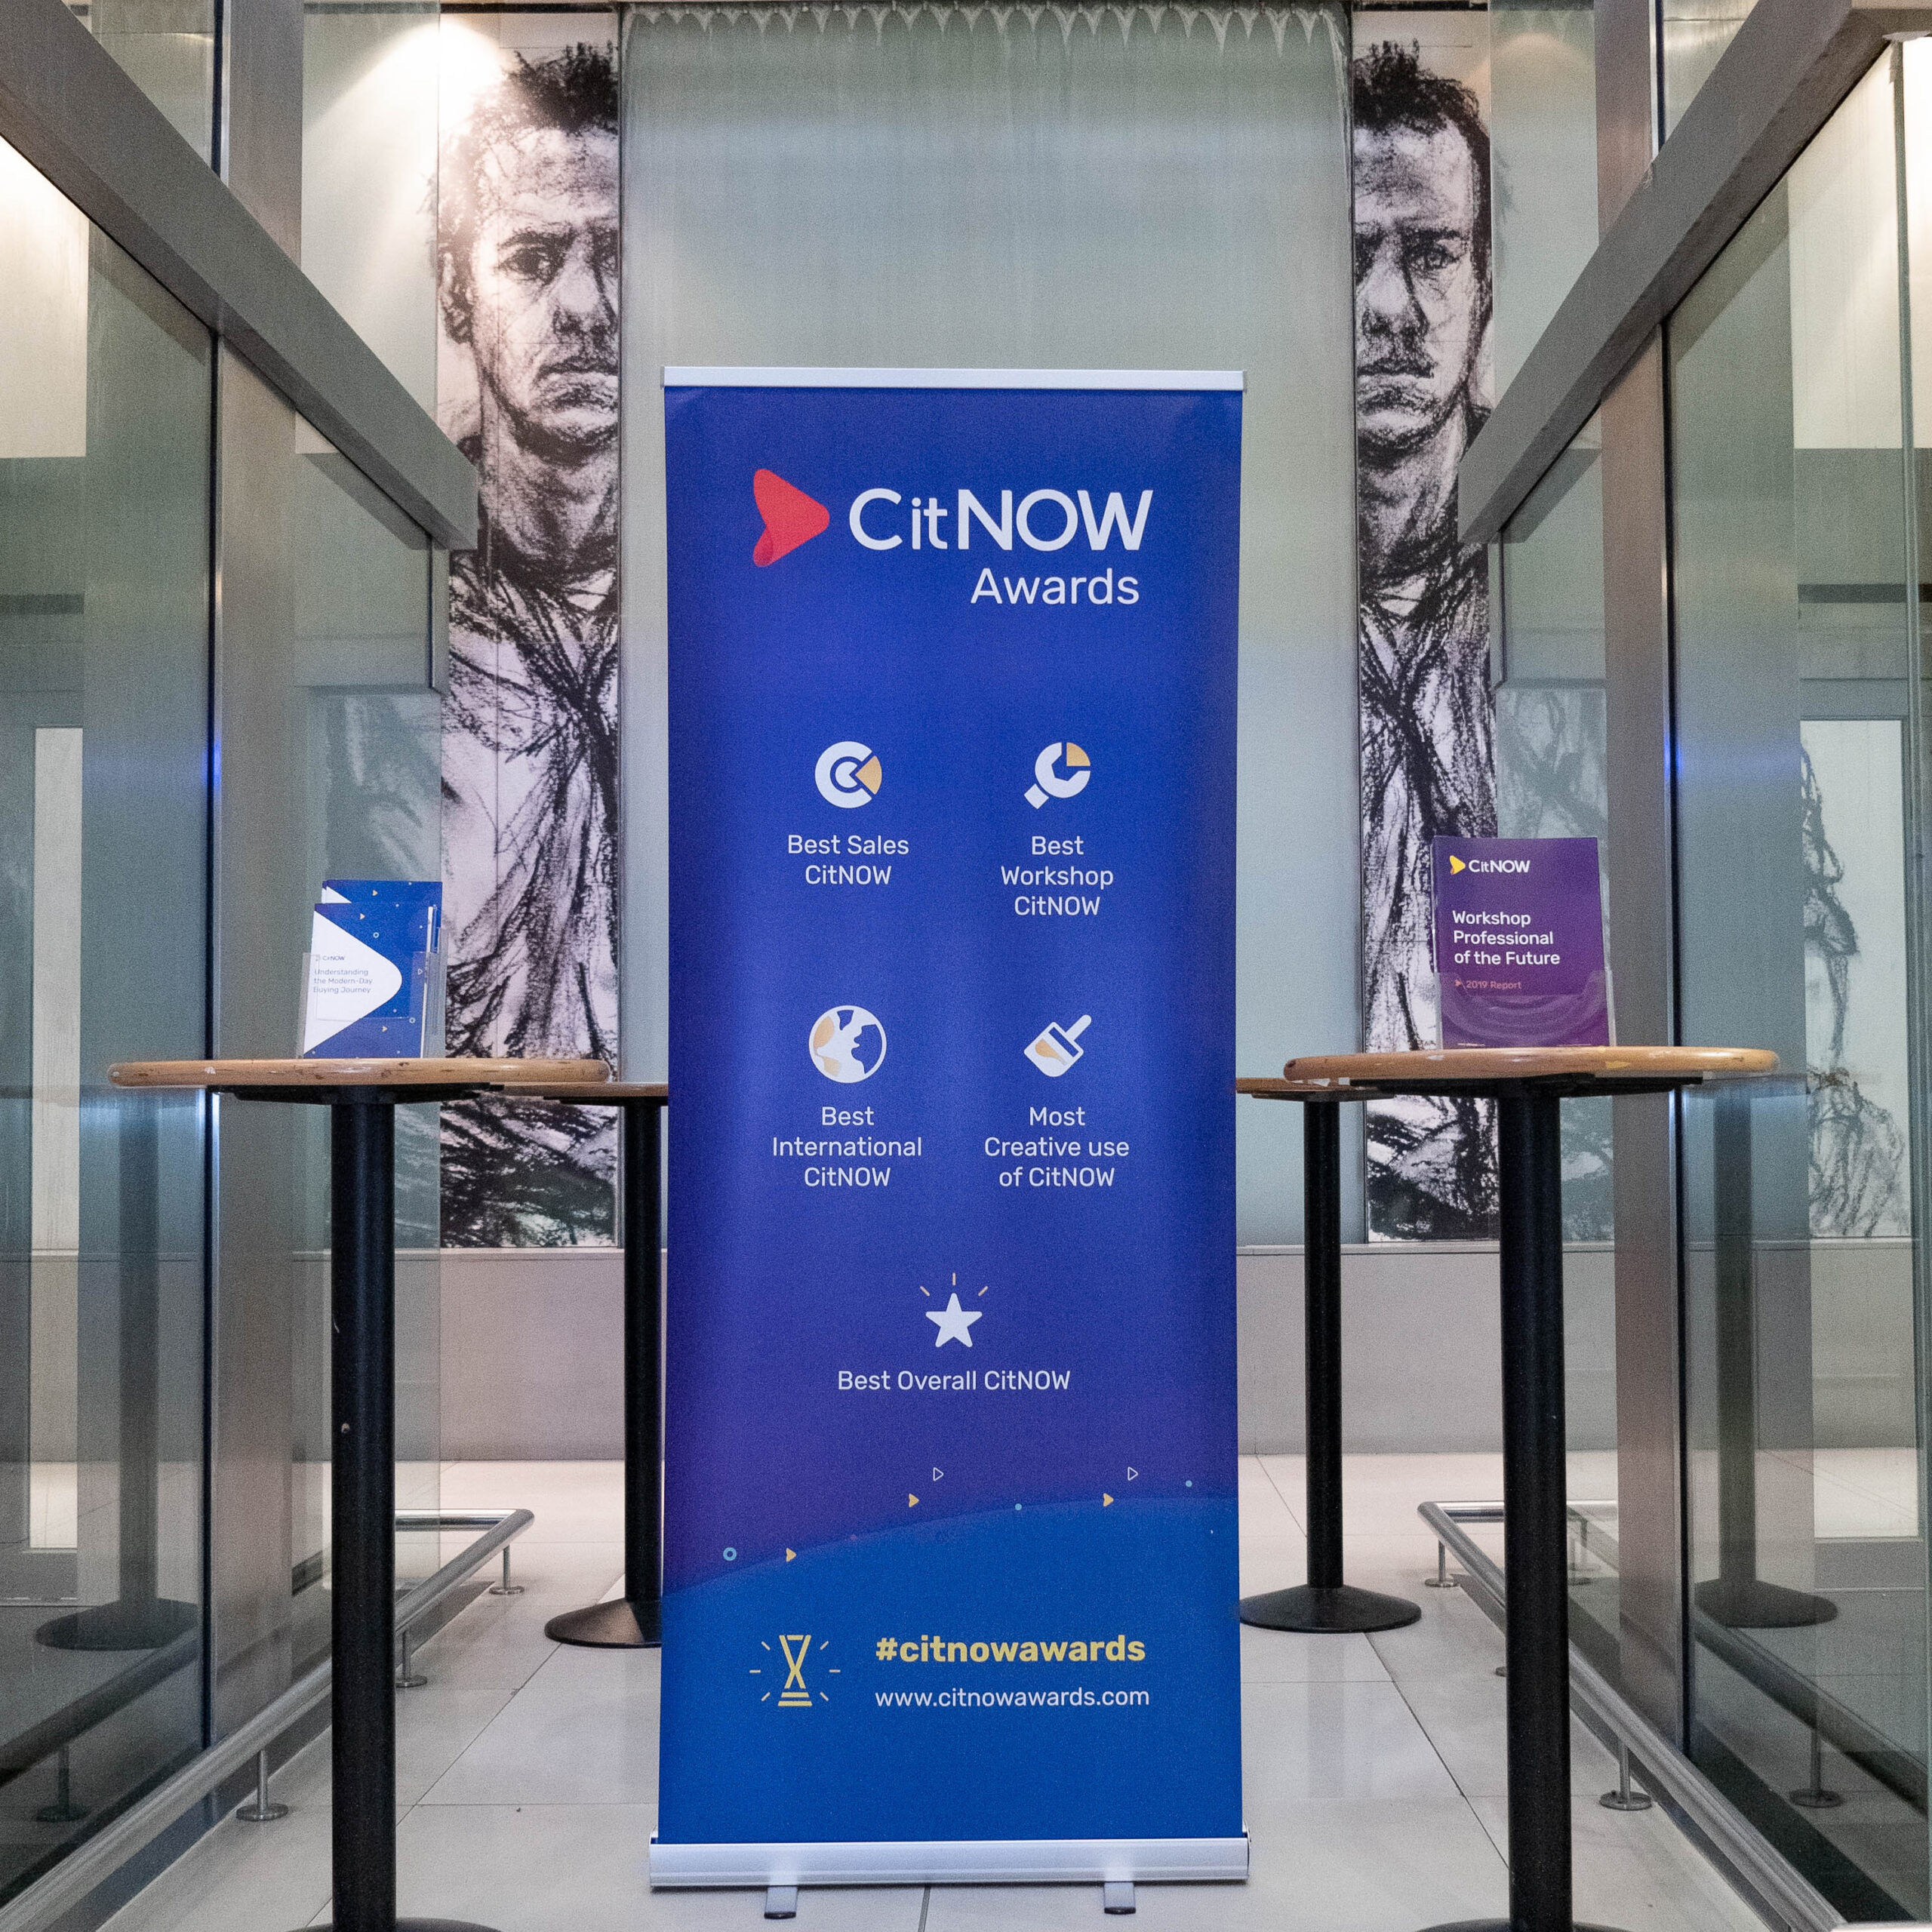 CitNOW Awards roller banner in blue